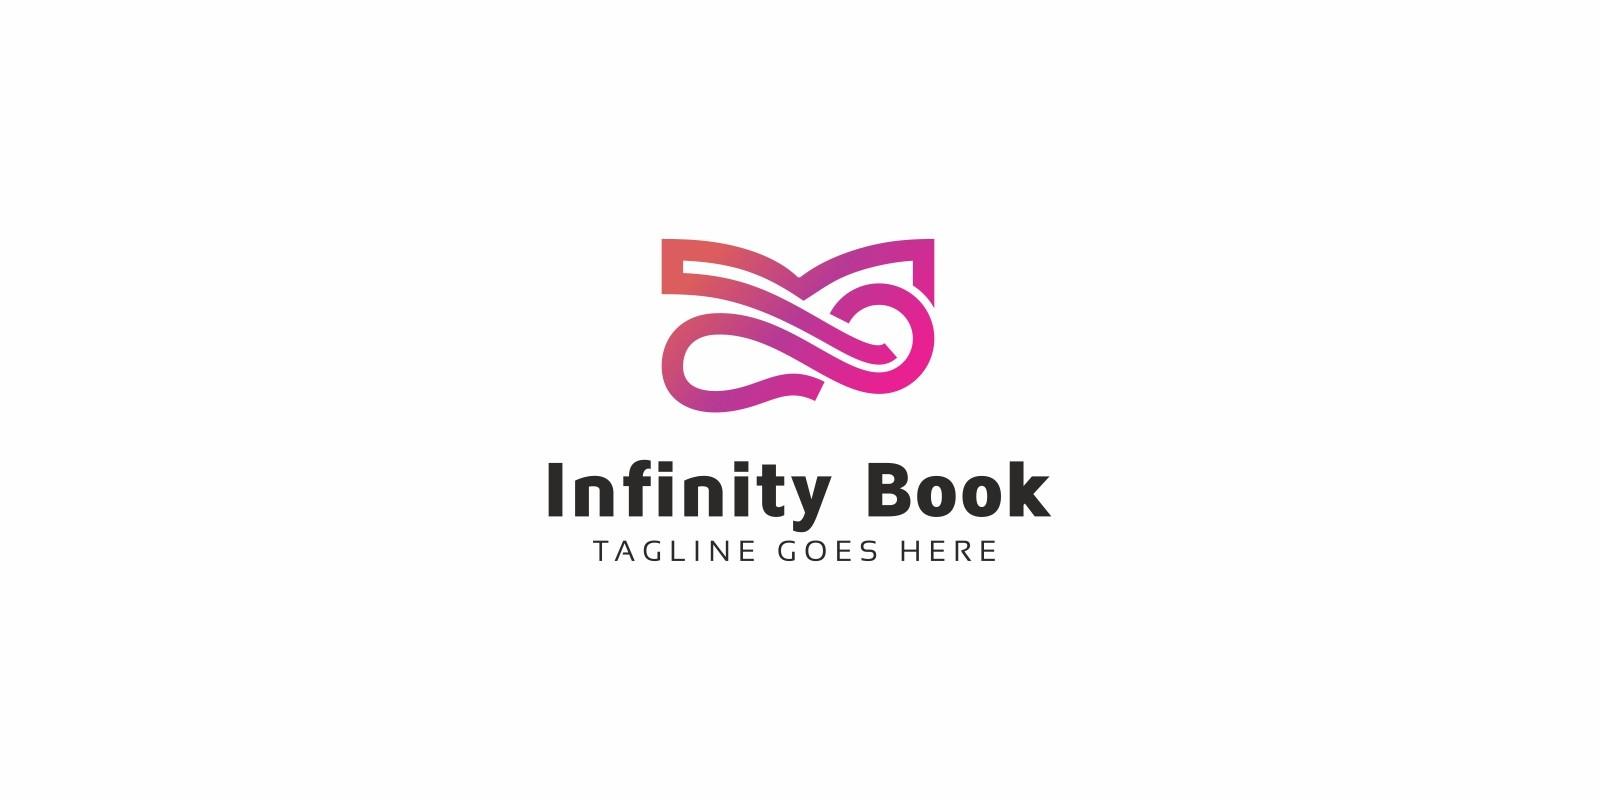 Infinity Book Logo